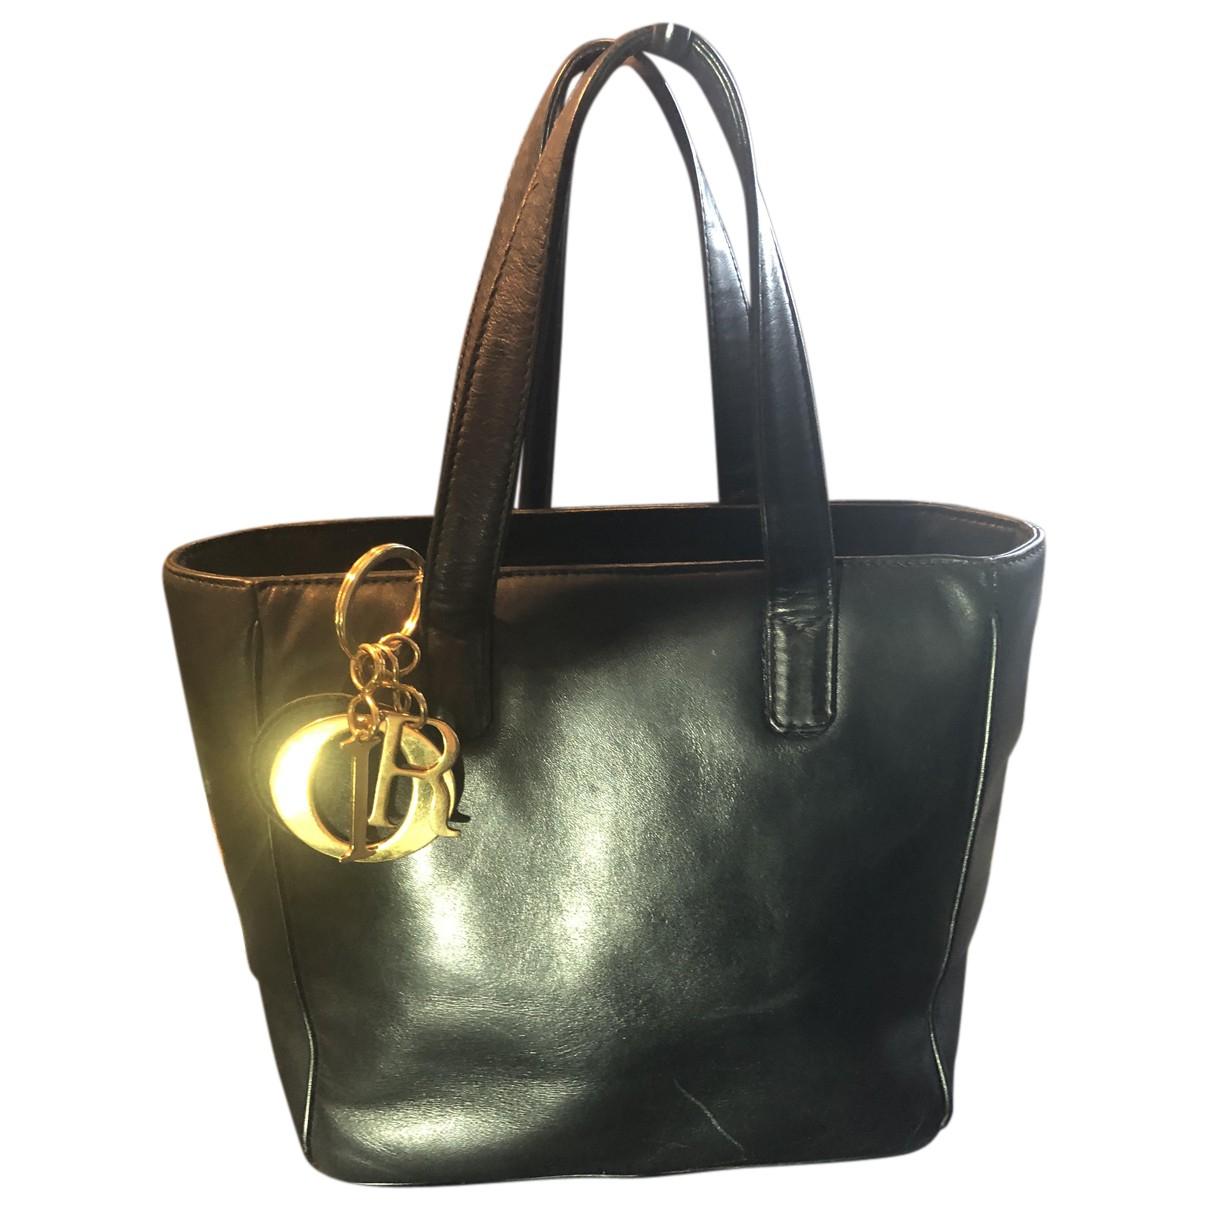 Dior N Black Leather handbag for Women N